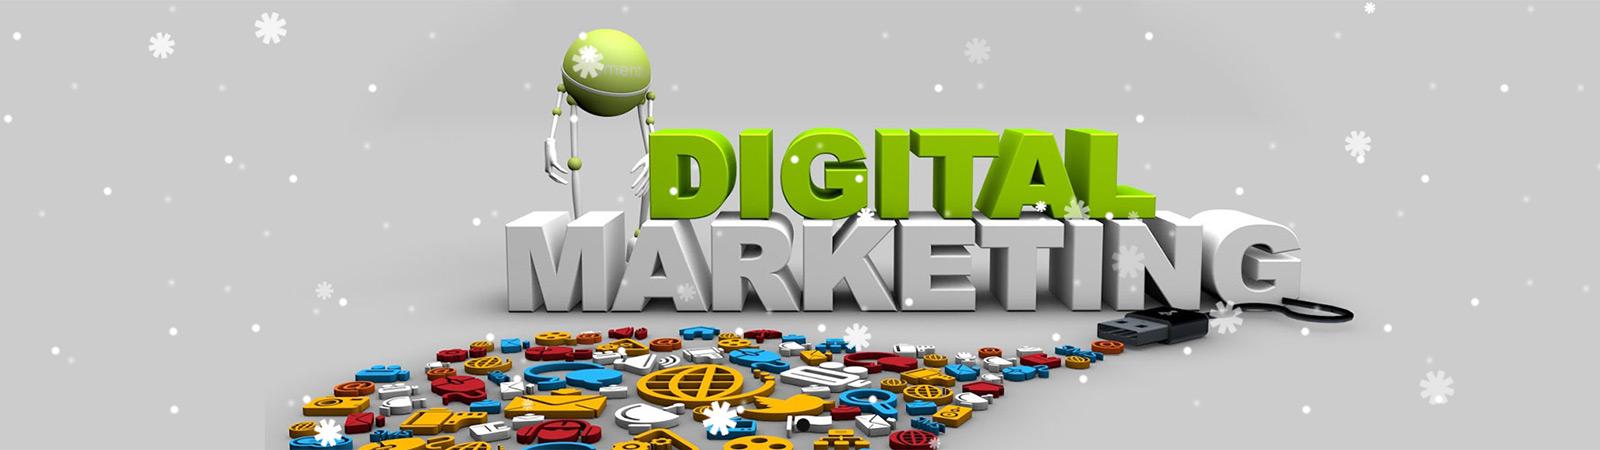 banner-digital